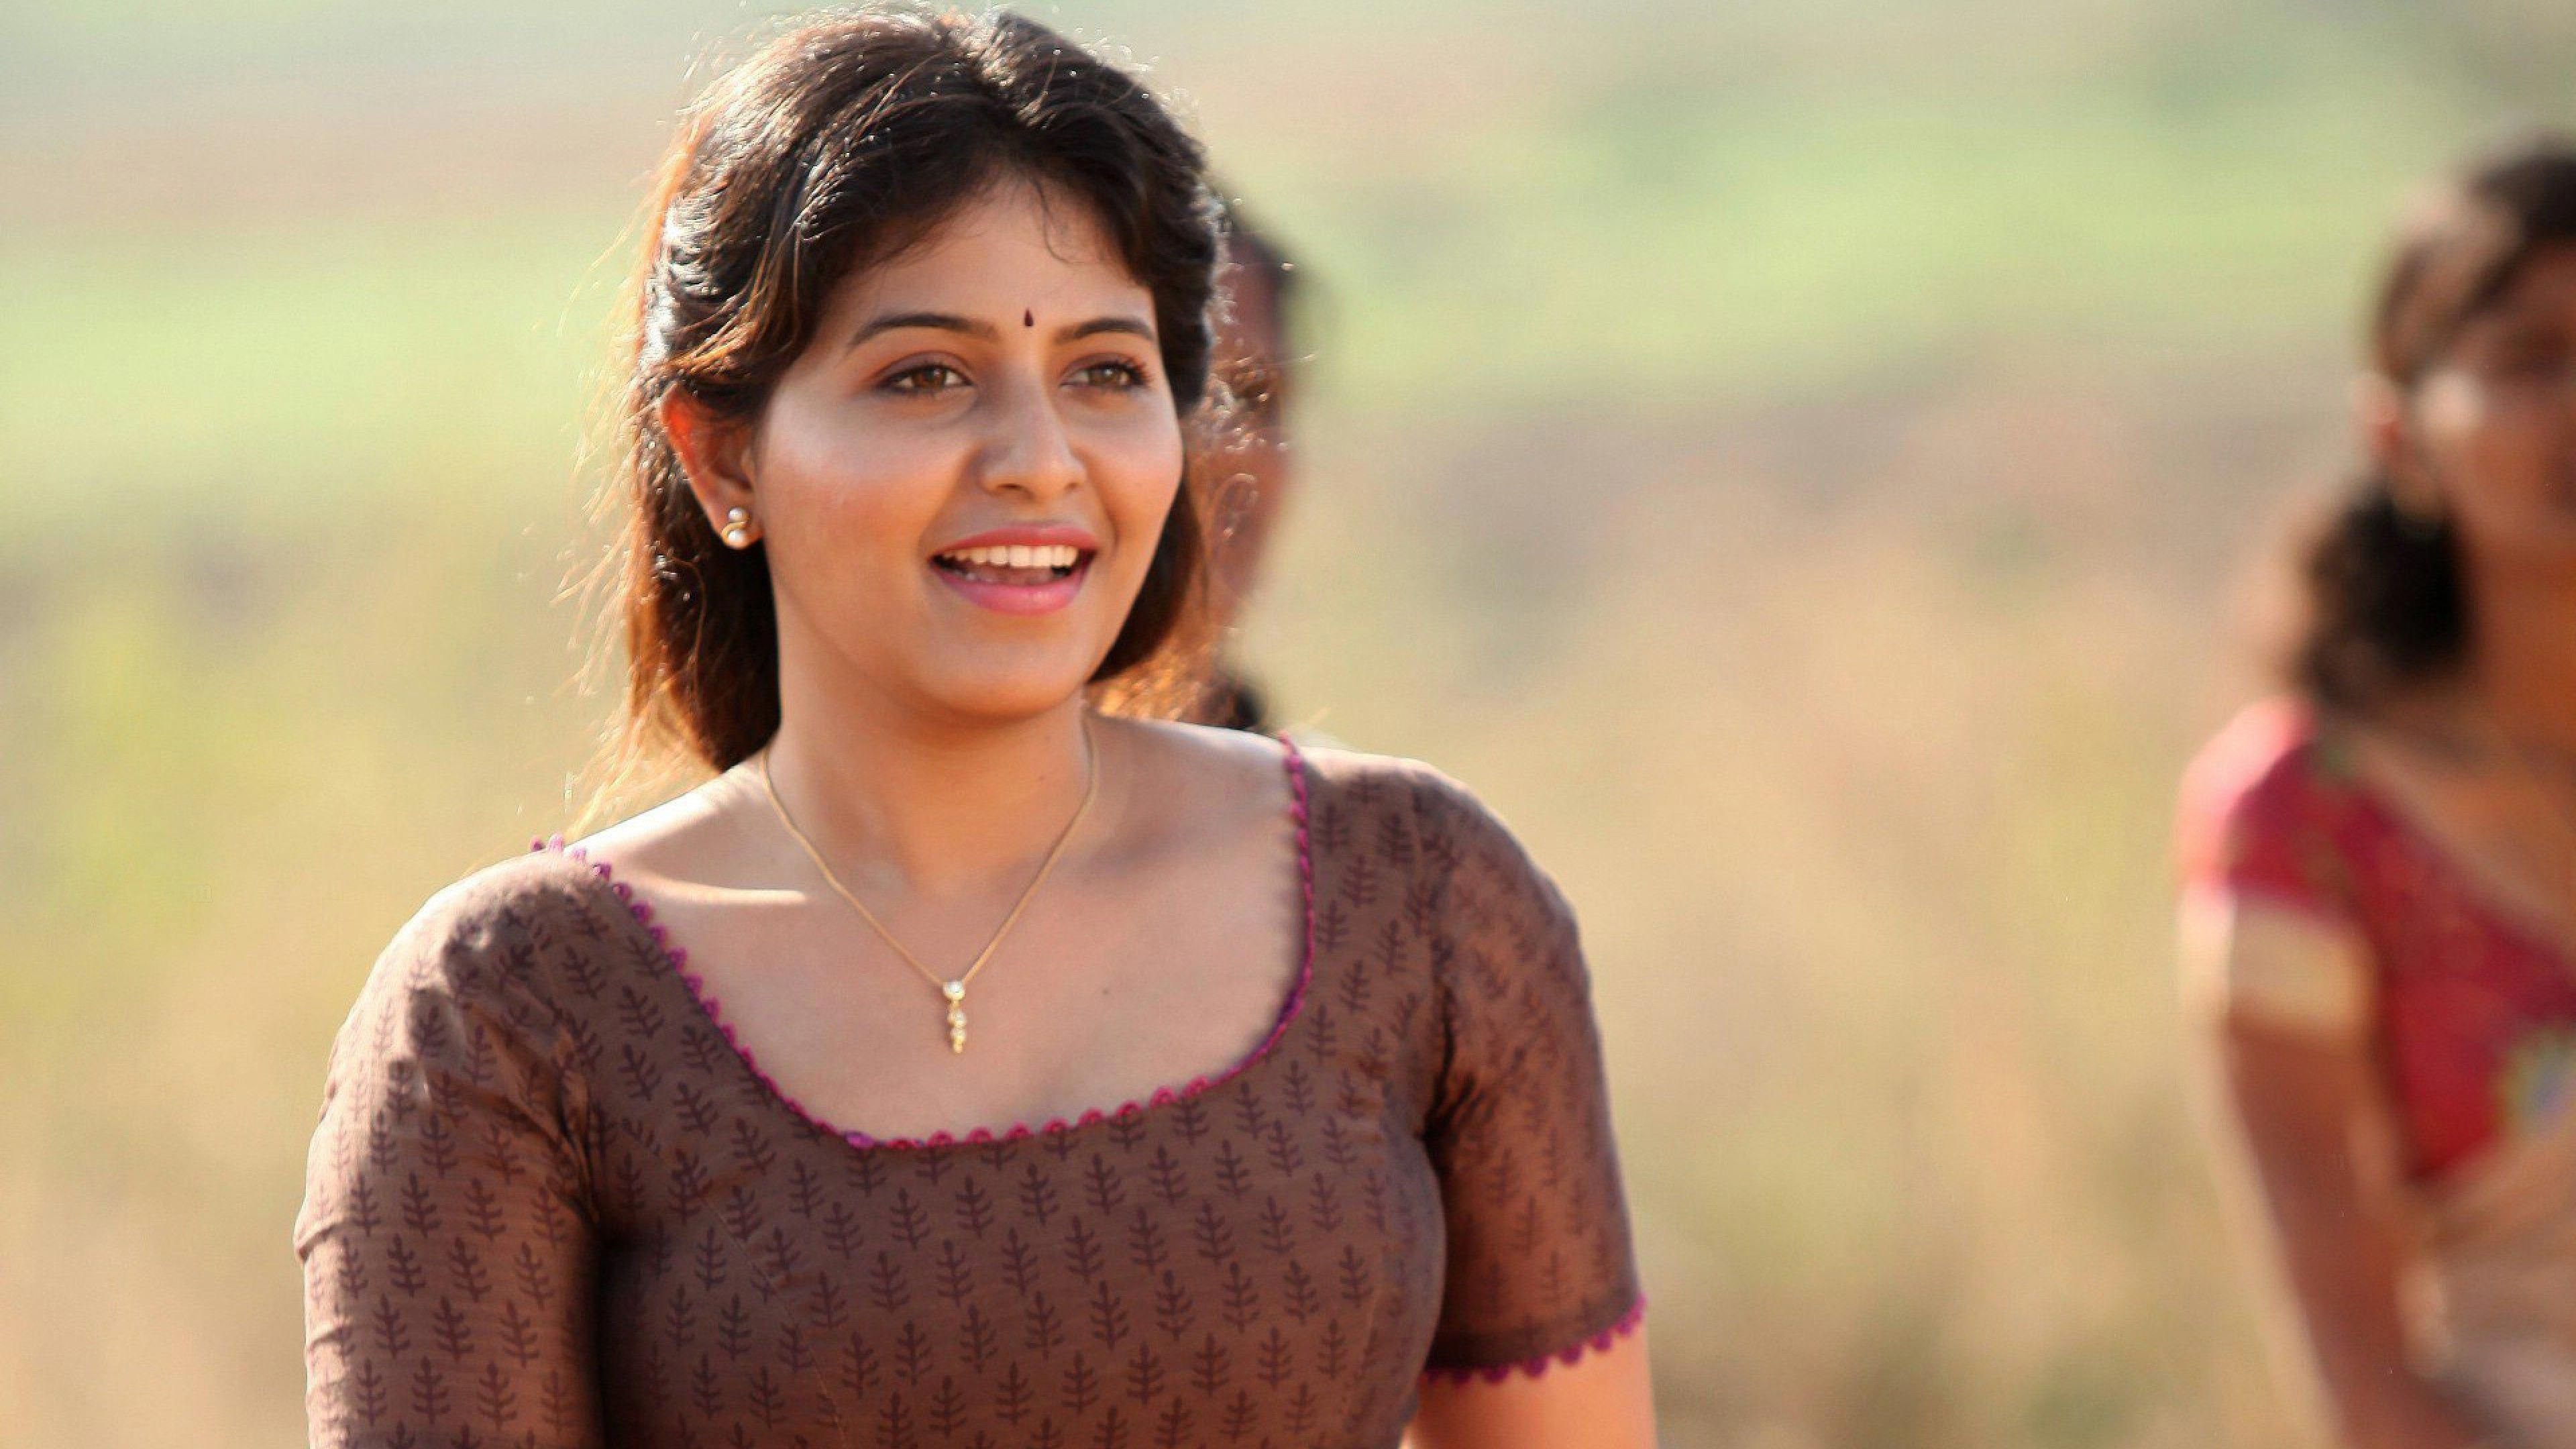 Anjali Tamil Actress Hd 4k Ultra Hd Wallpaper Hd 1080p Wallpaper Actresses Tamil Actress Indian Actresses